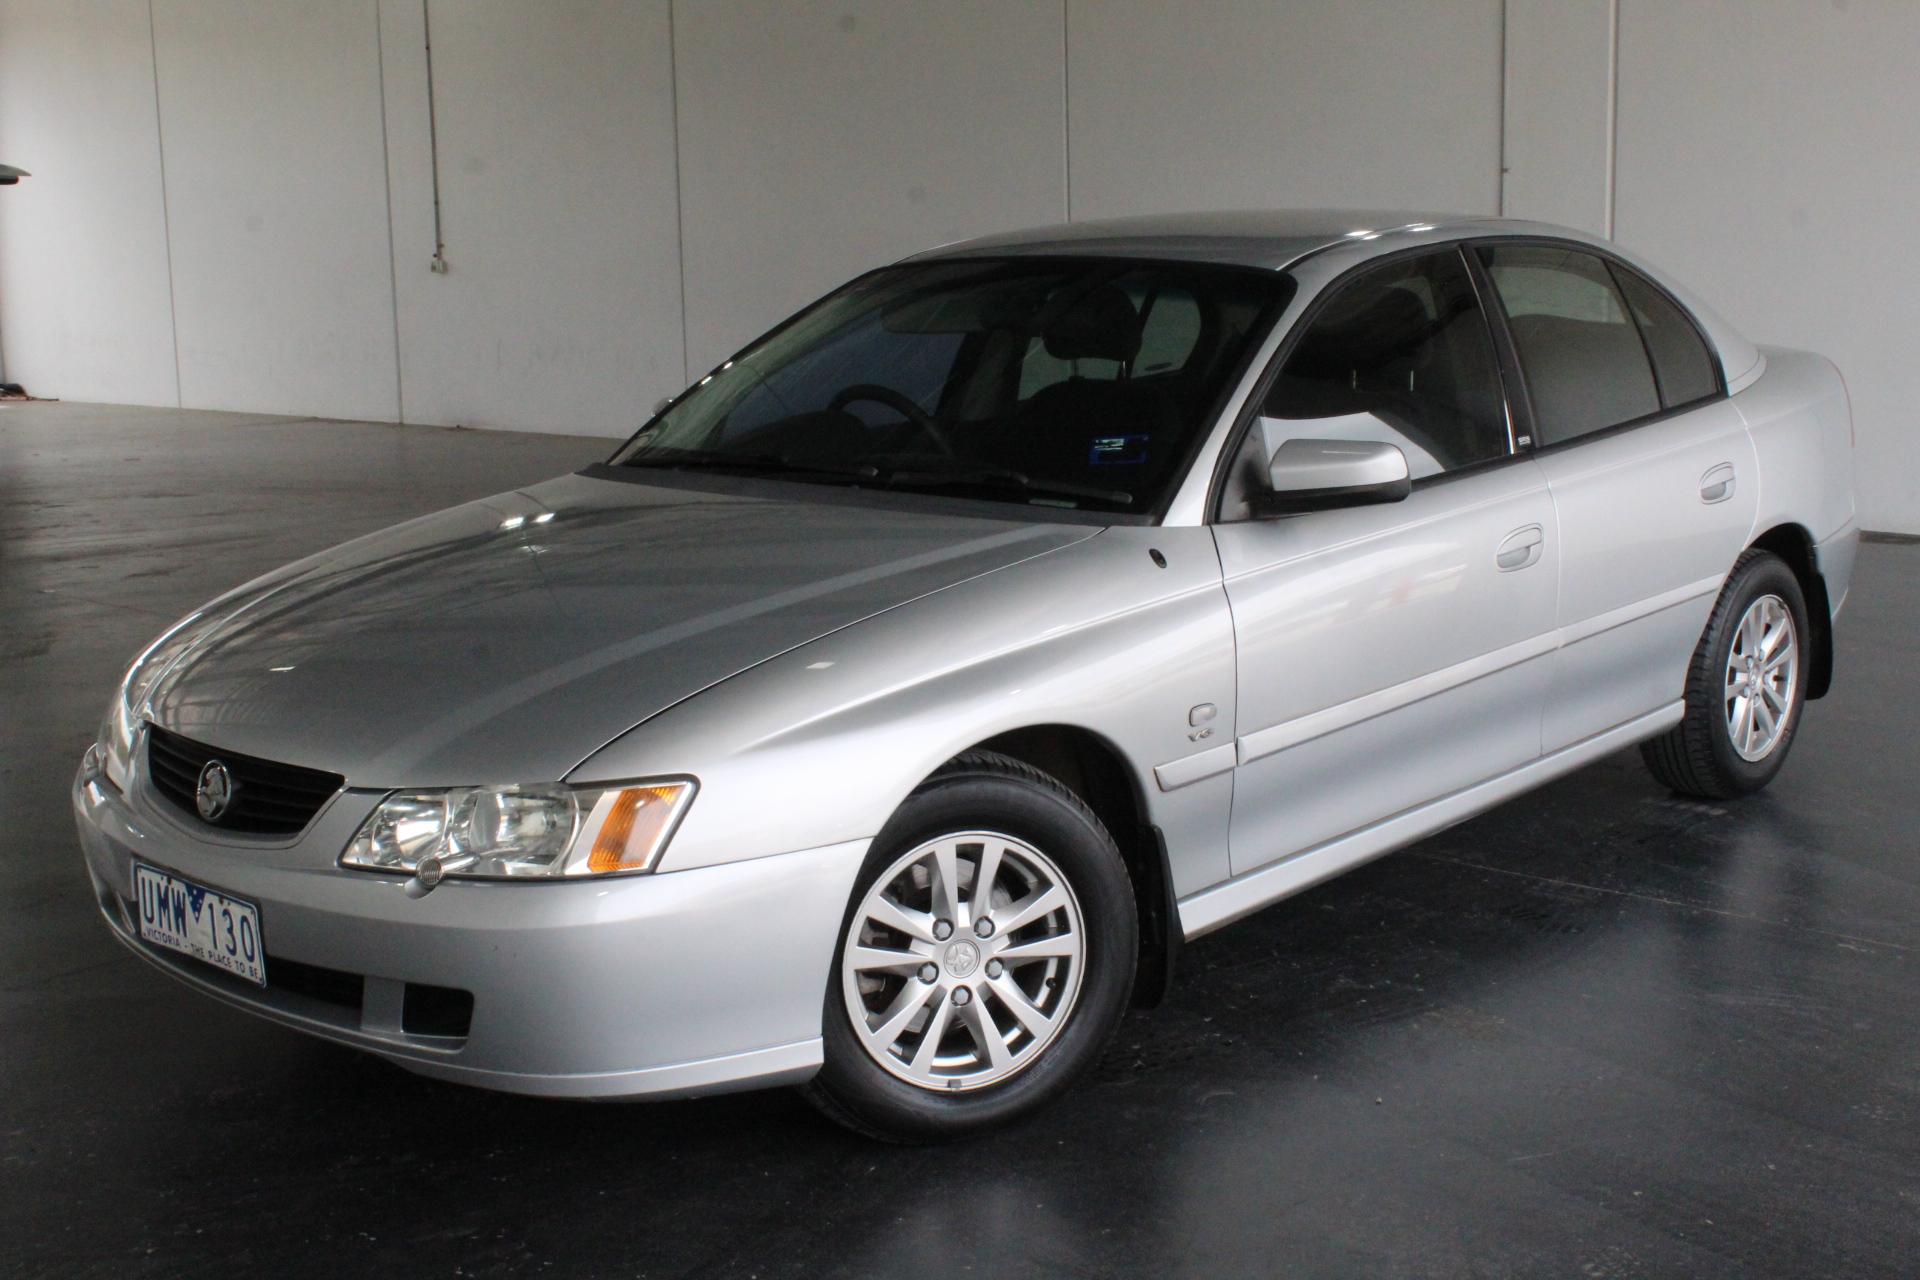 2004 Holden Commodore Acclaim Y Series Automatic Sedan